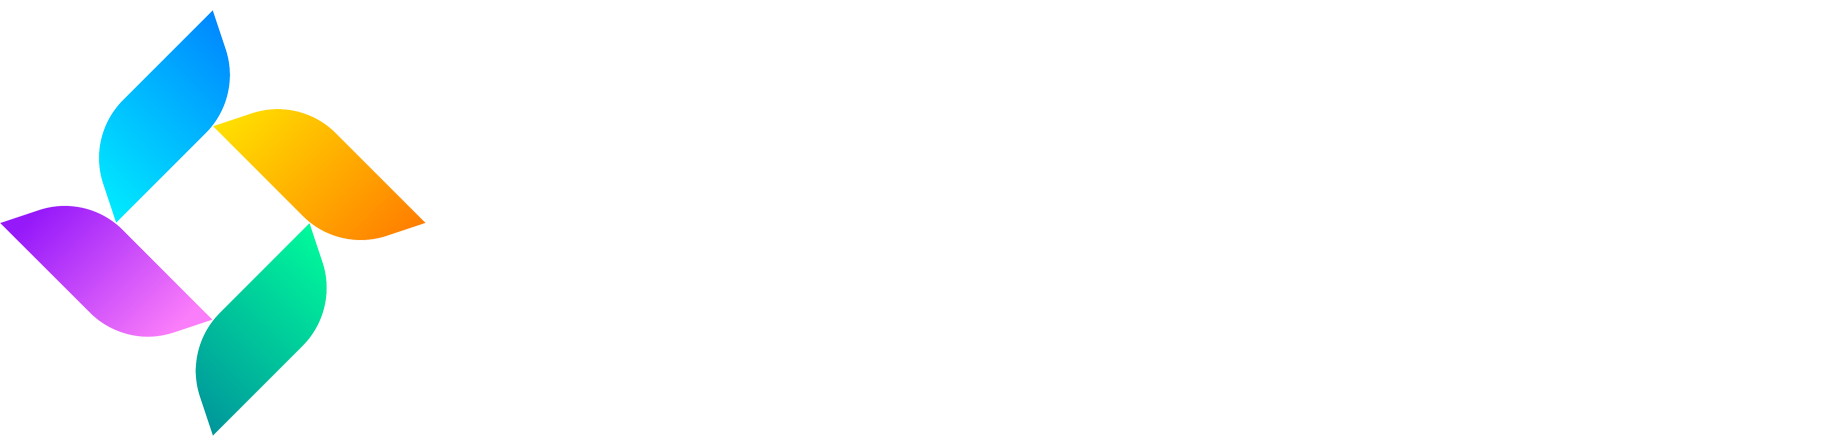 Neuroception 360